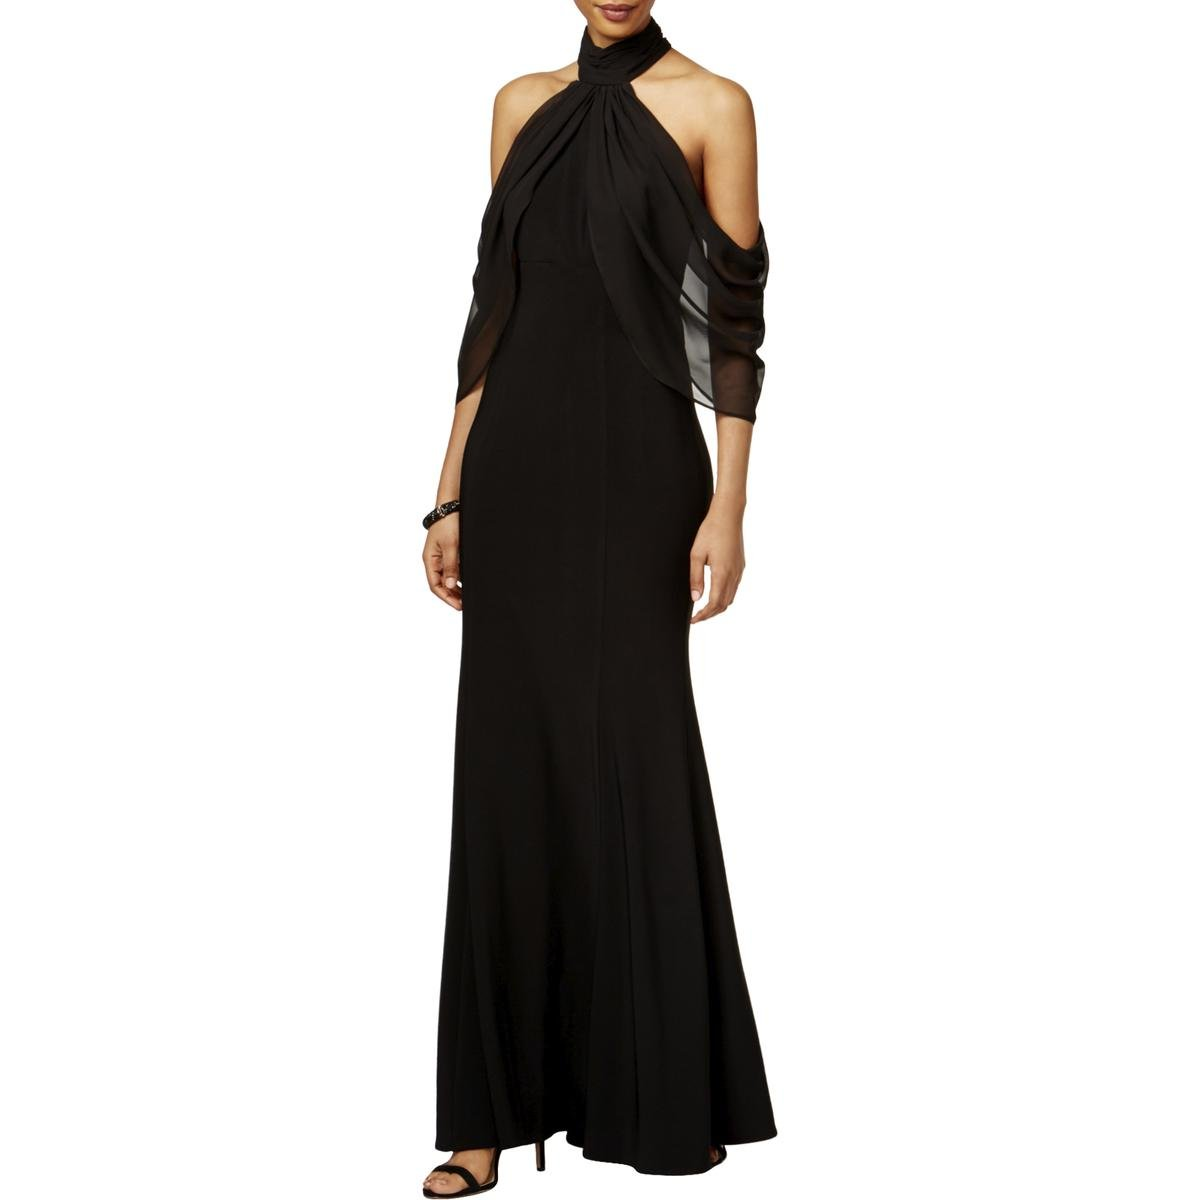 Xscape $229 Womens New 1045 Black Cold Shoulder Mermaid Dress 4 B+B